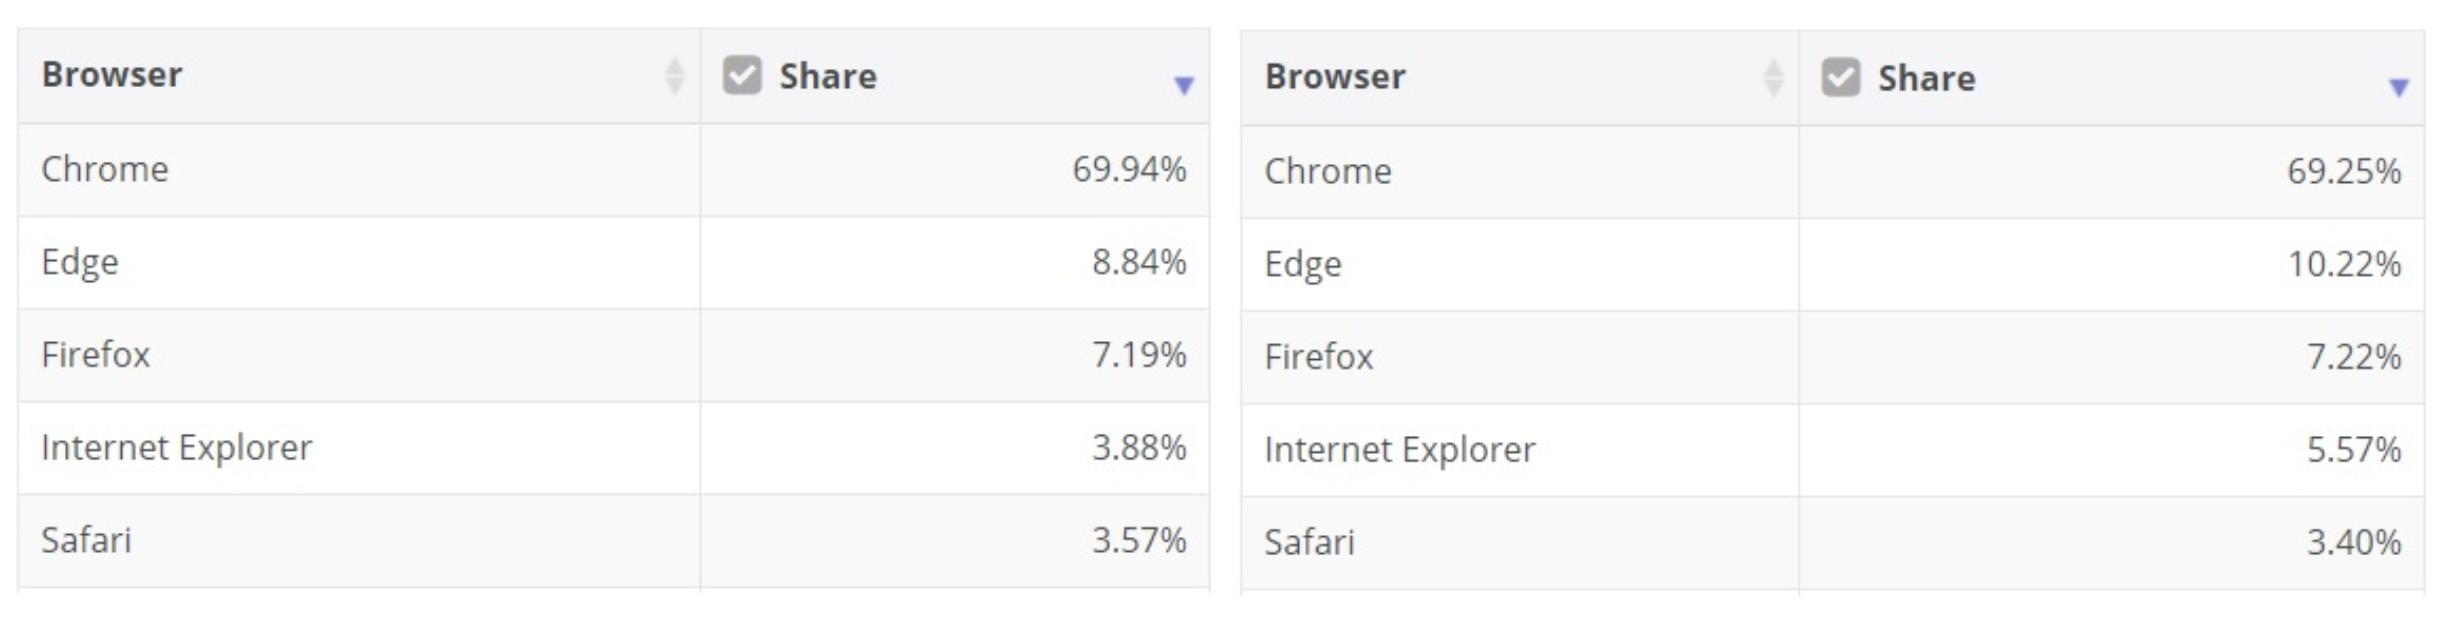 Google Chrome Microsoft Edge Mozilla Firefox Apple Safari